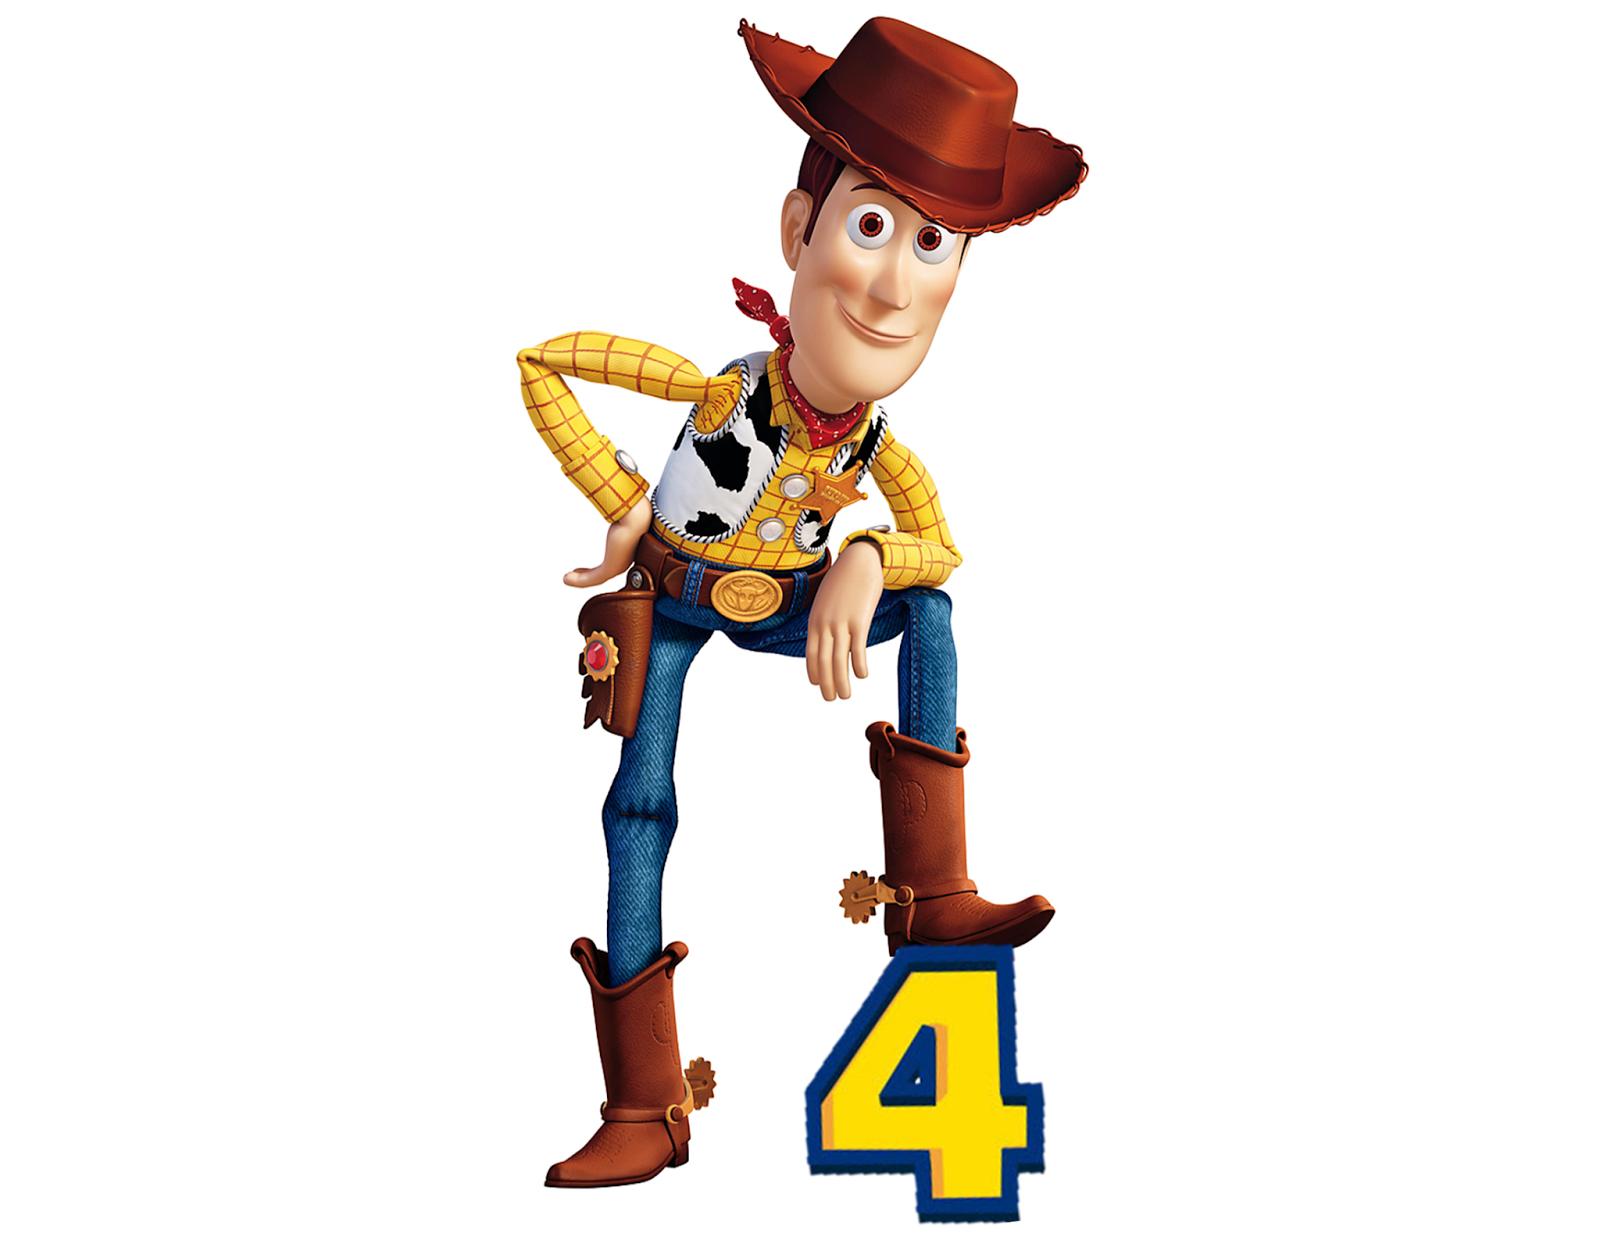 Toy Story 4 Toys : Pixar corner may